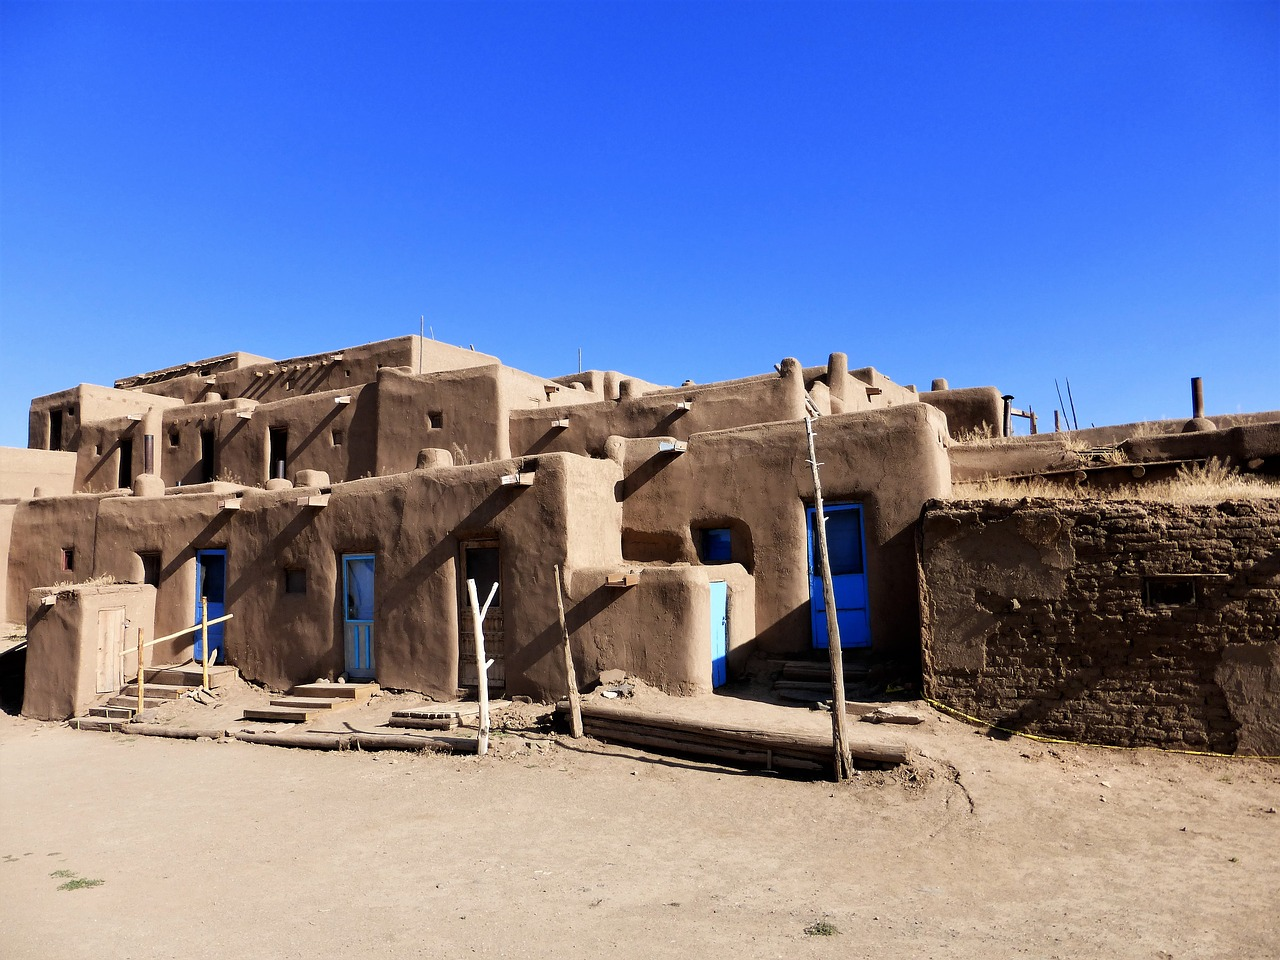 Bucket List Destination 9: New Mexico